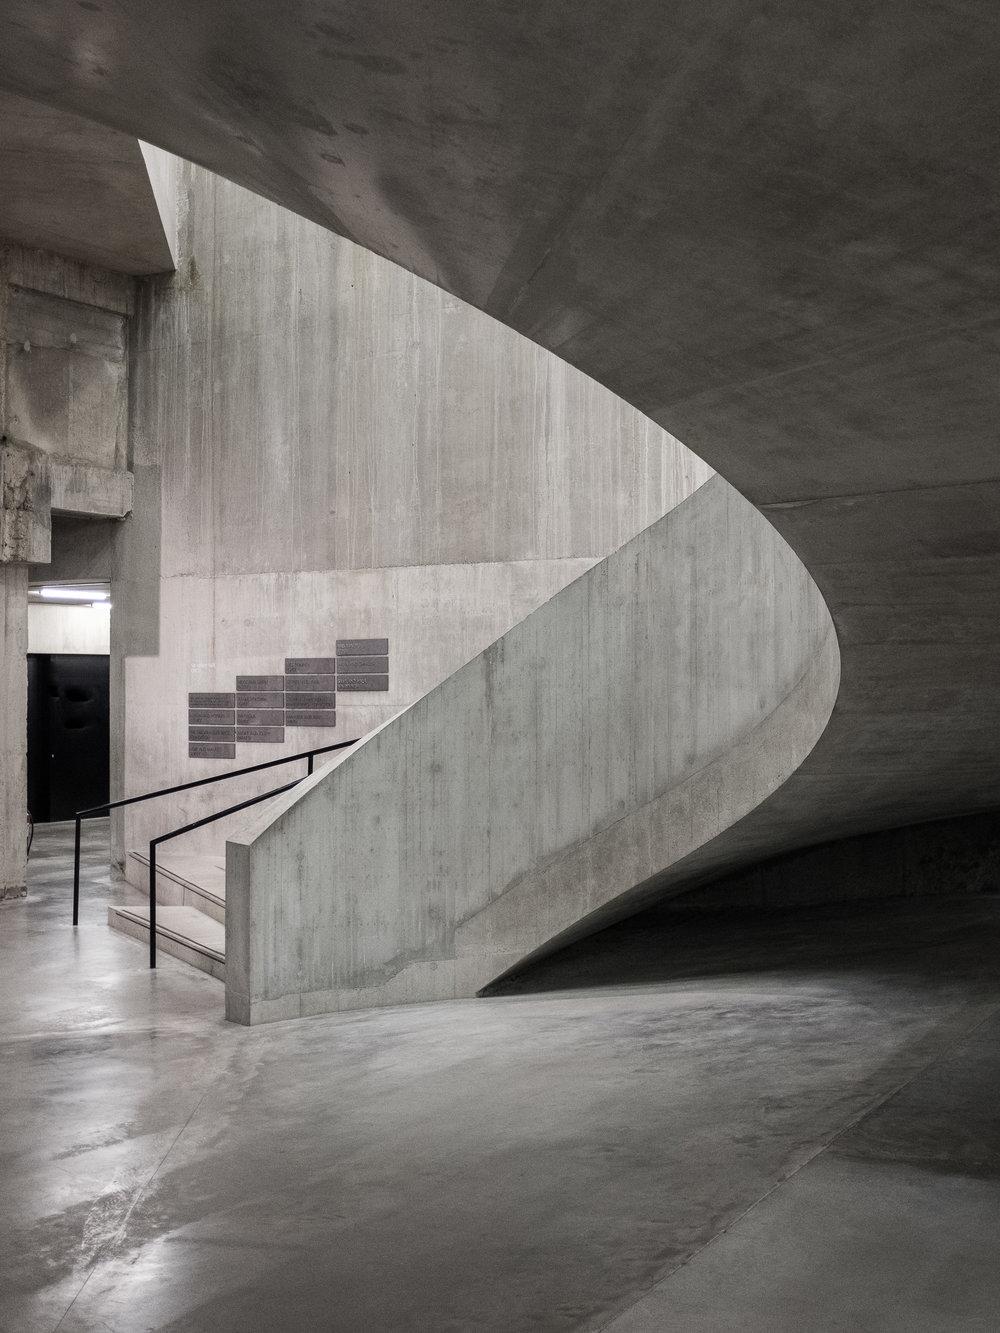 Tate Modern by handover-12.jpg